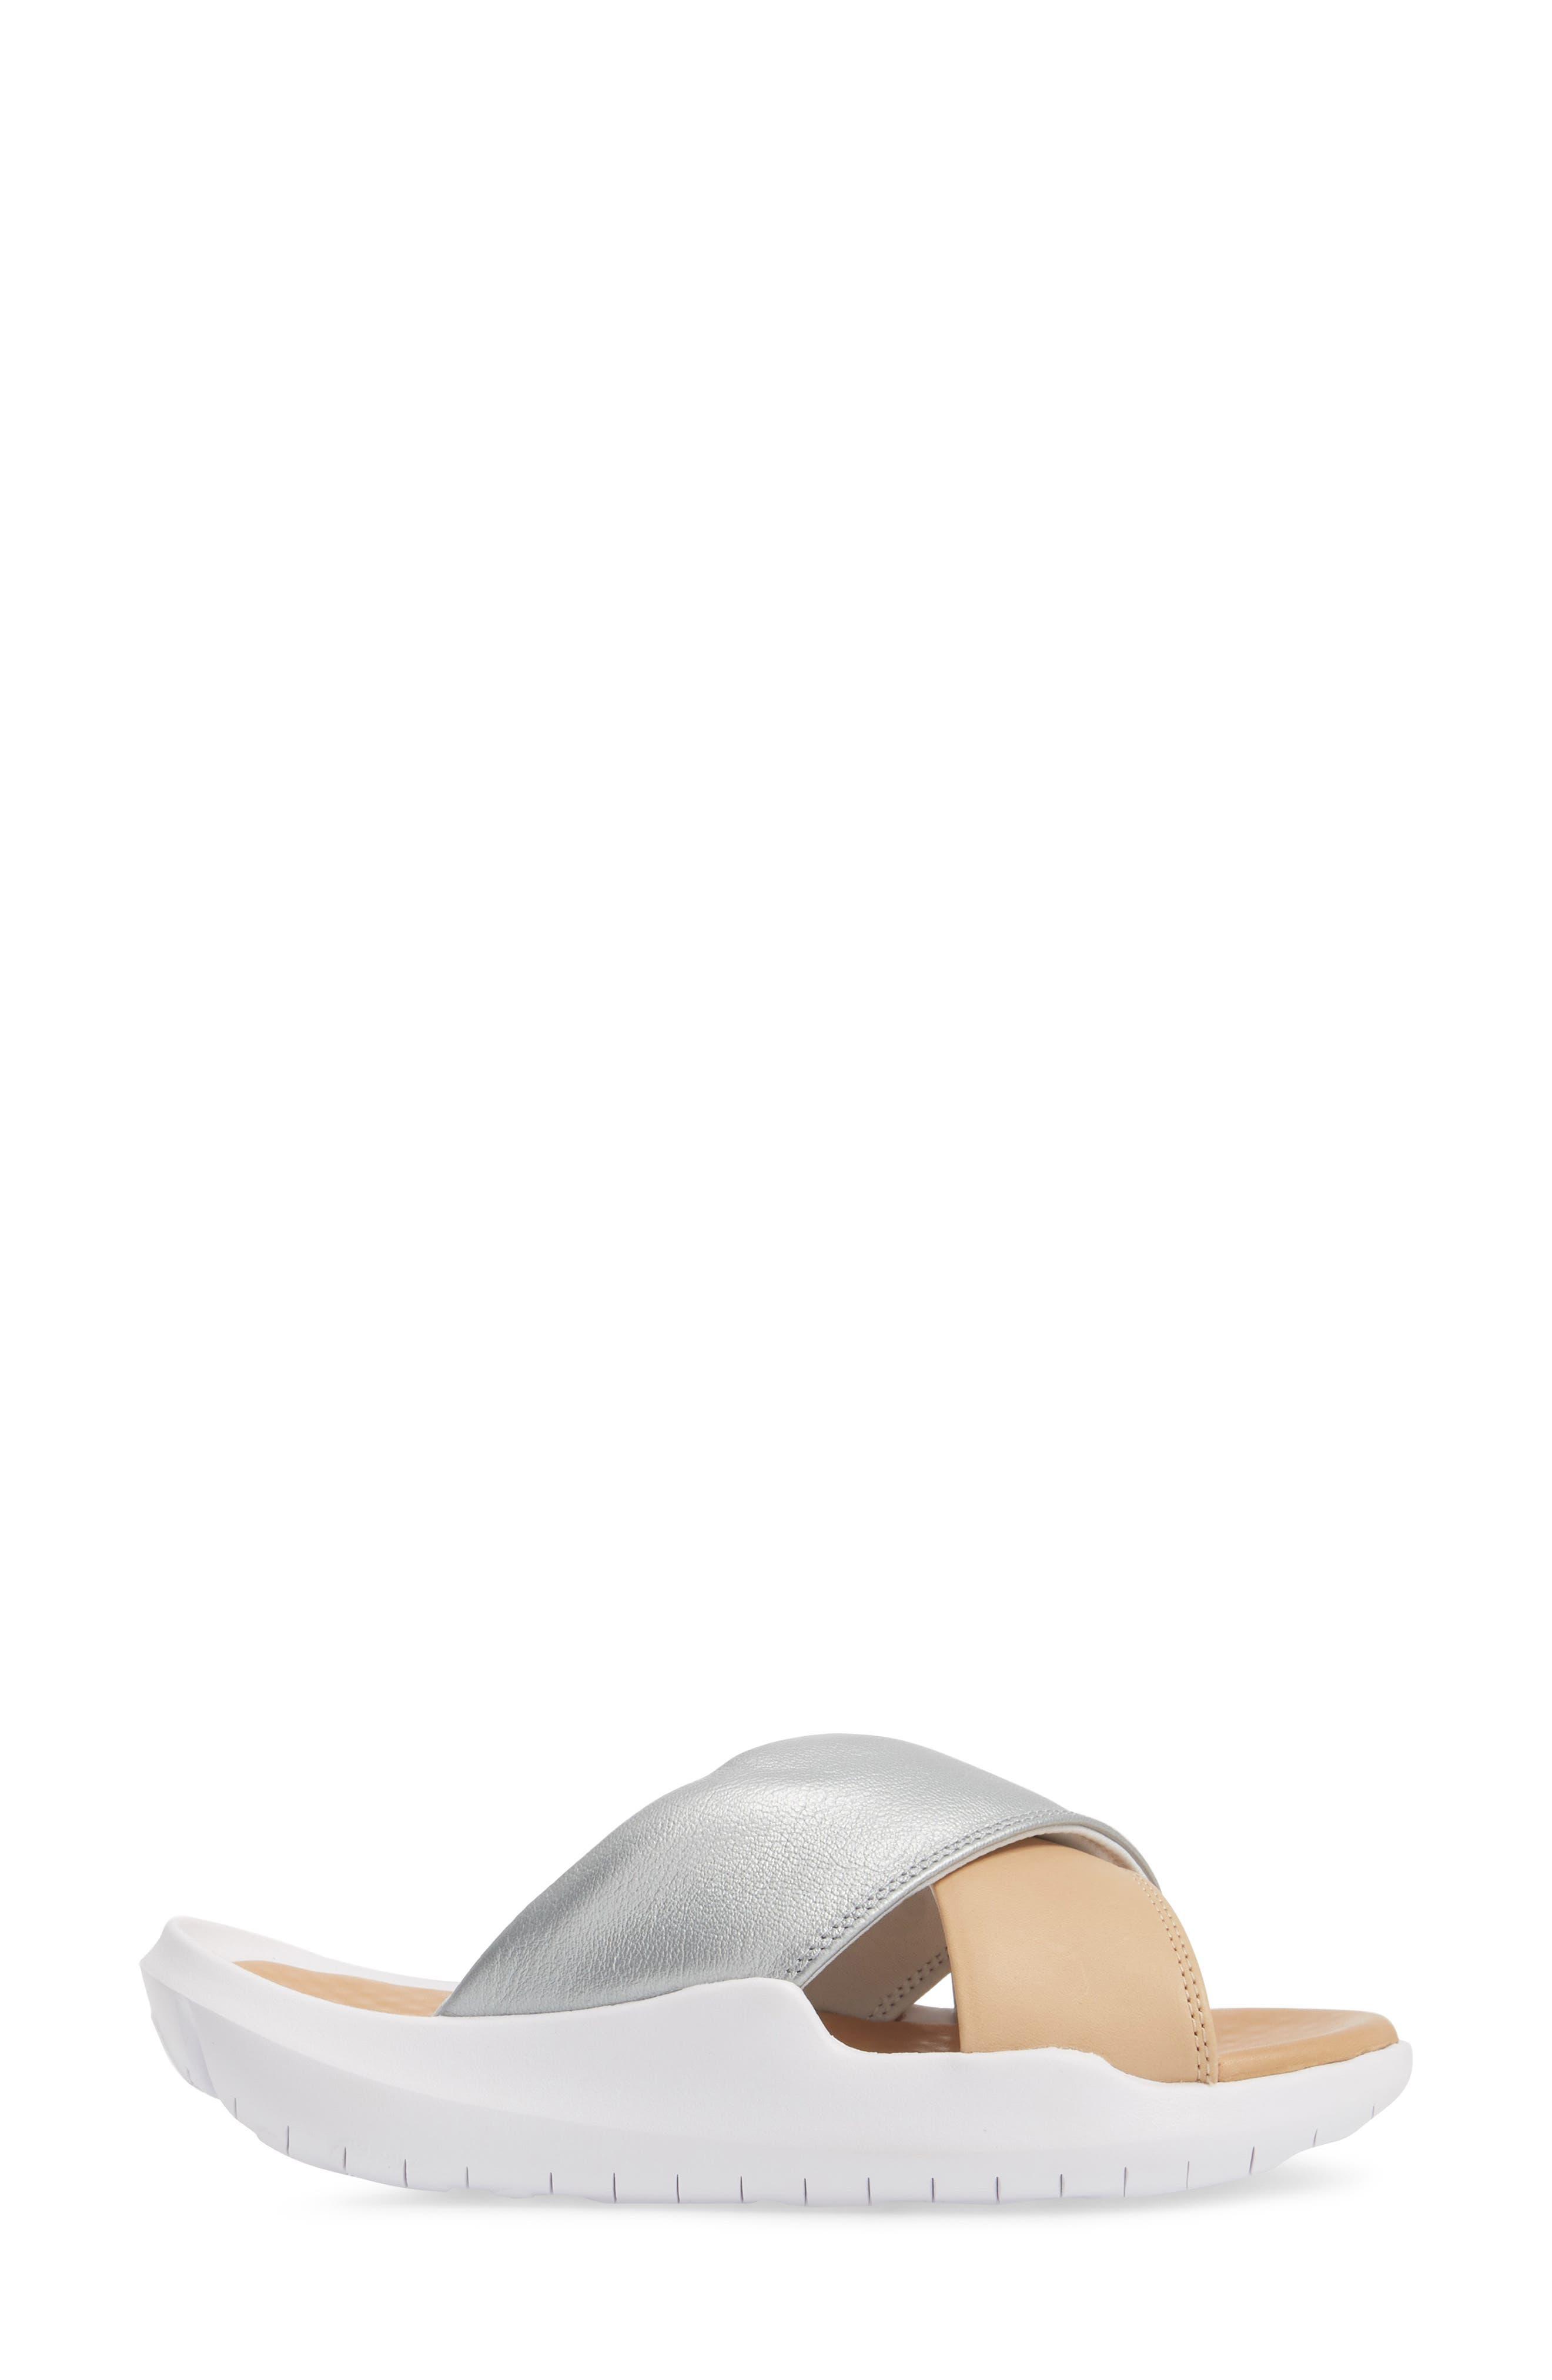 Nordstrom x Nike Benassi Future Cross SE Premium Slide,                             Alternate thumbnail 3, color,                             METALLIC SILVER/ BIO BEIGE